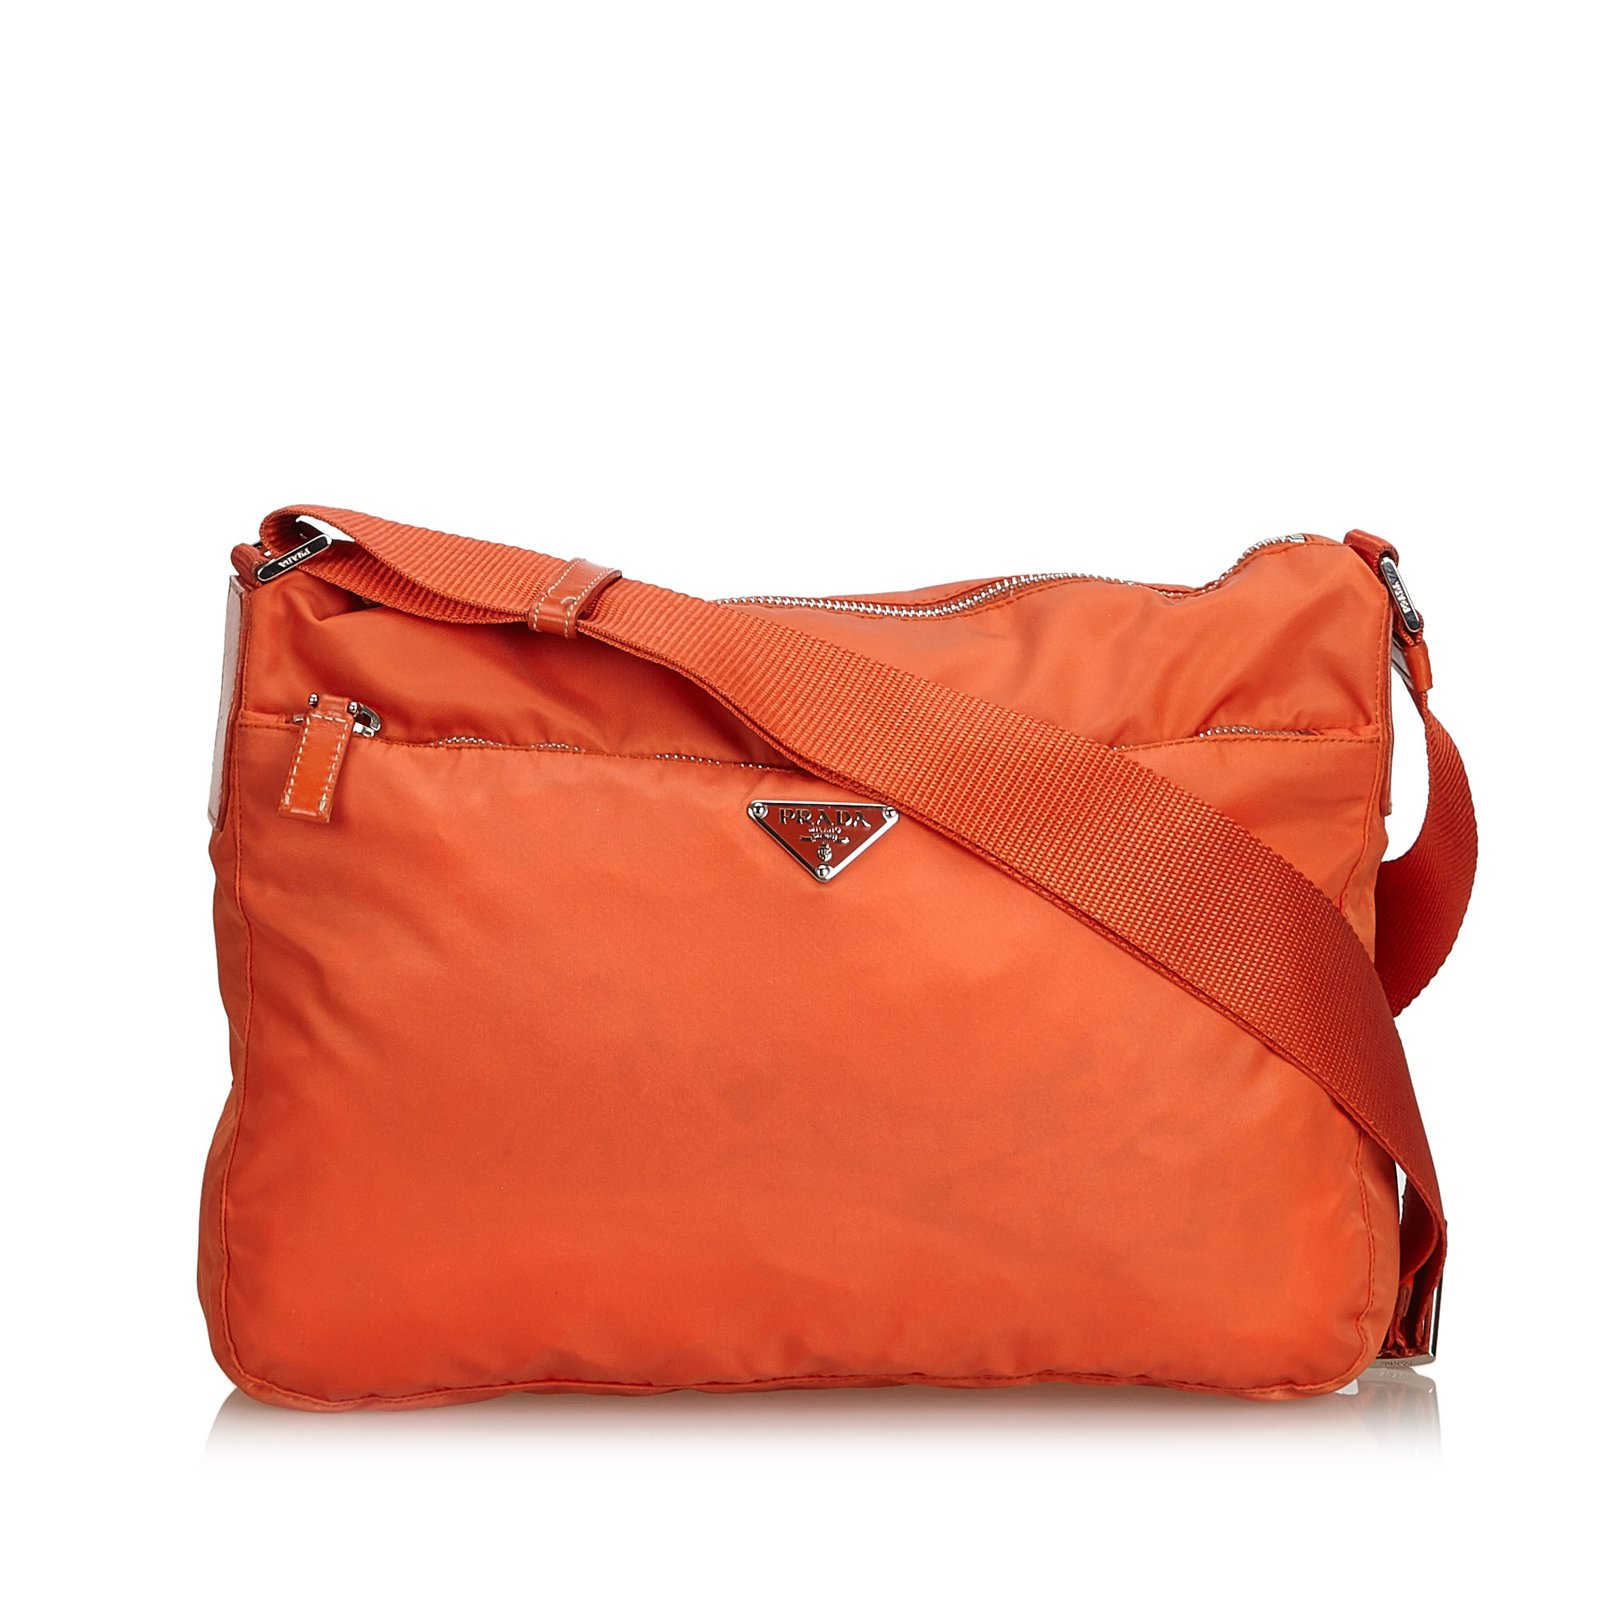 Prada Nylon Crossbody Bag Handbags Leather,Other,nylon,Cloth Orange  ref.101108 fcdc027305